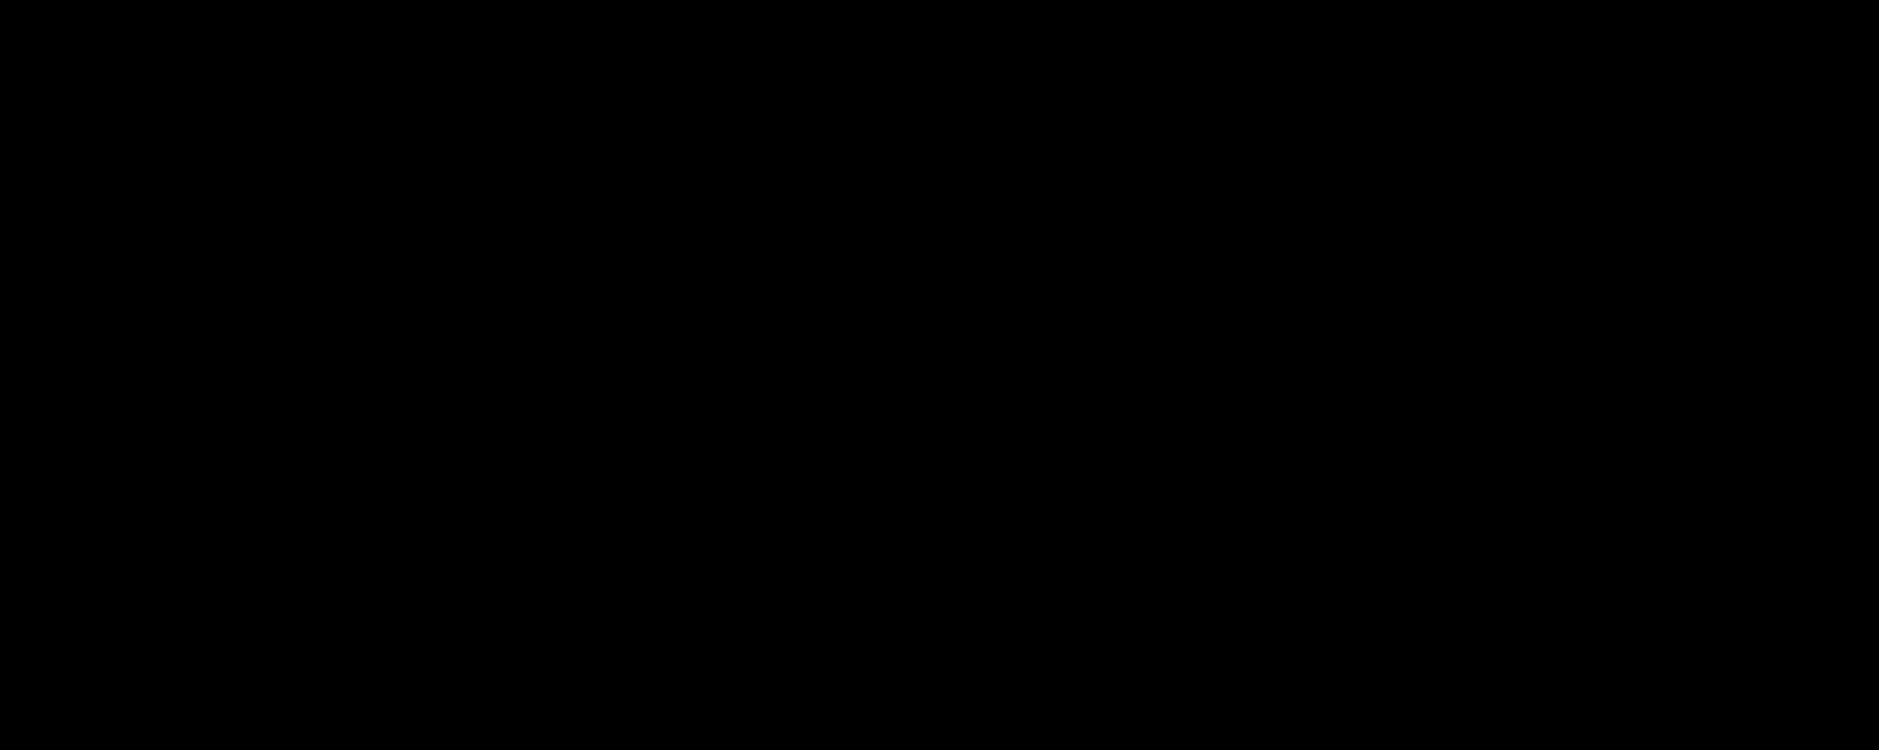 Angle,Organ,Symmetry